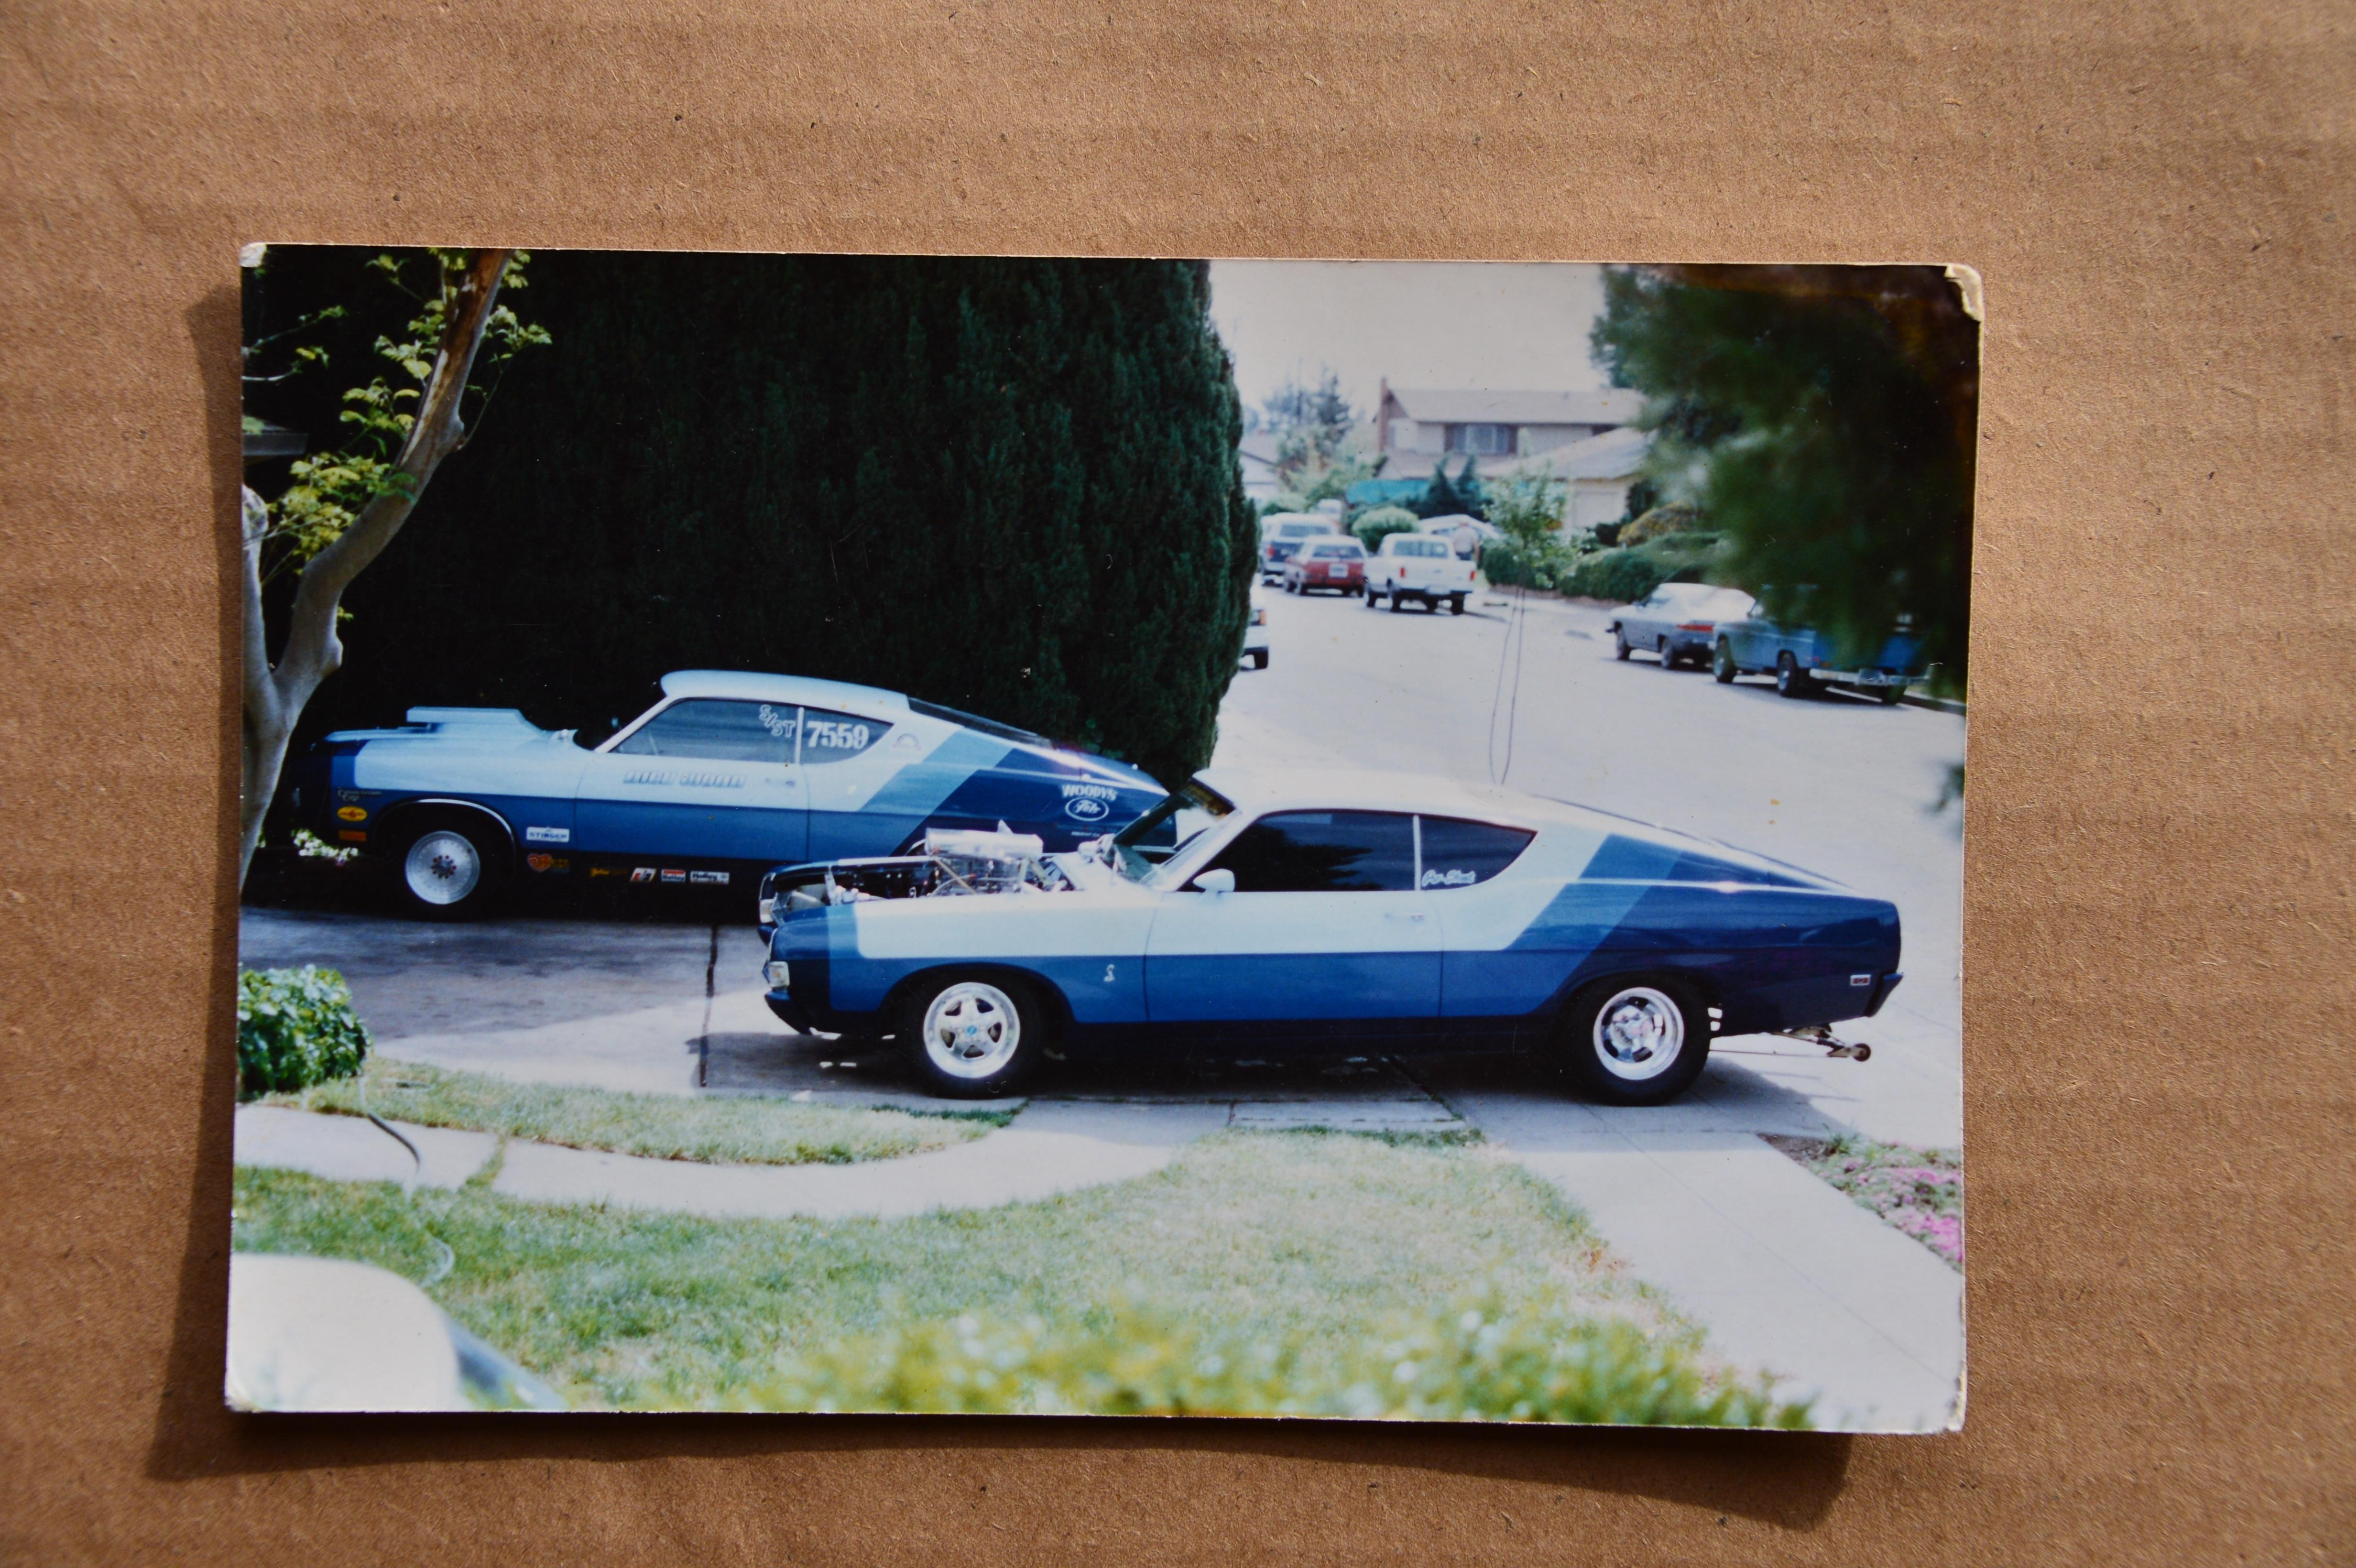 003 Rare Find 1969 Ford Fairlane Cobra Drag Team Two Cars Driveway